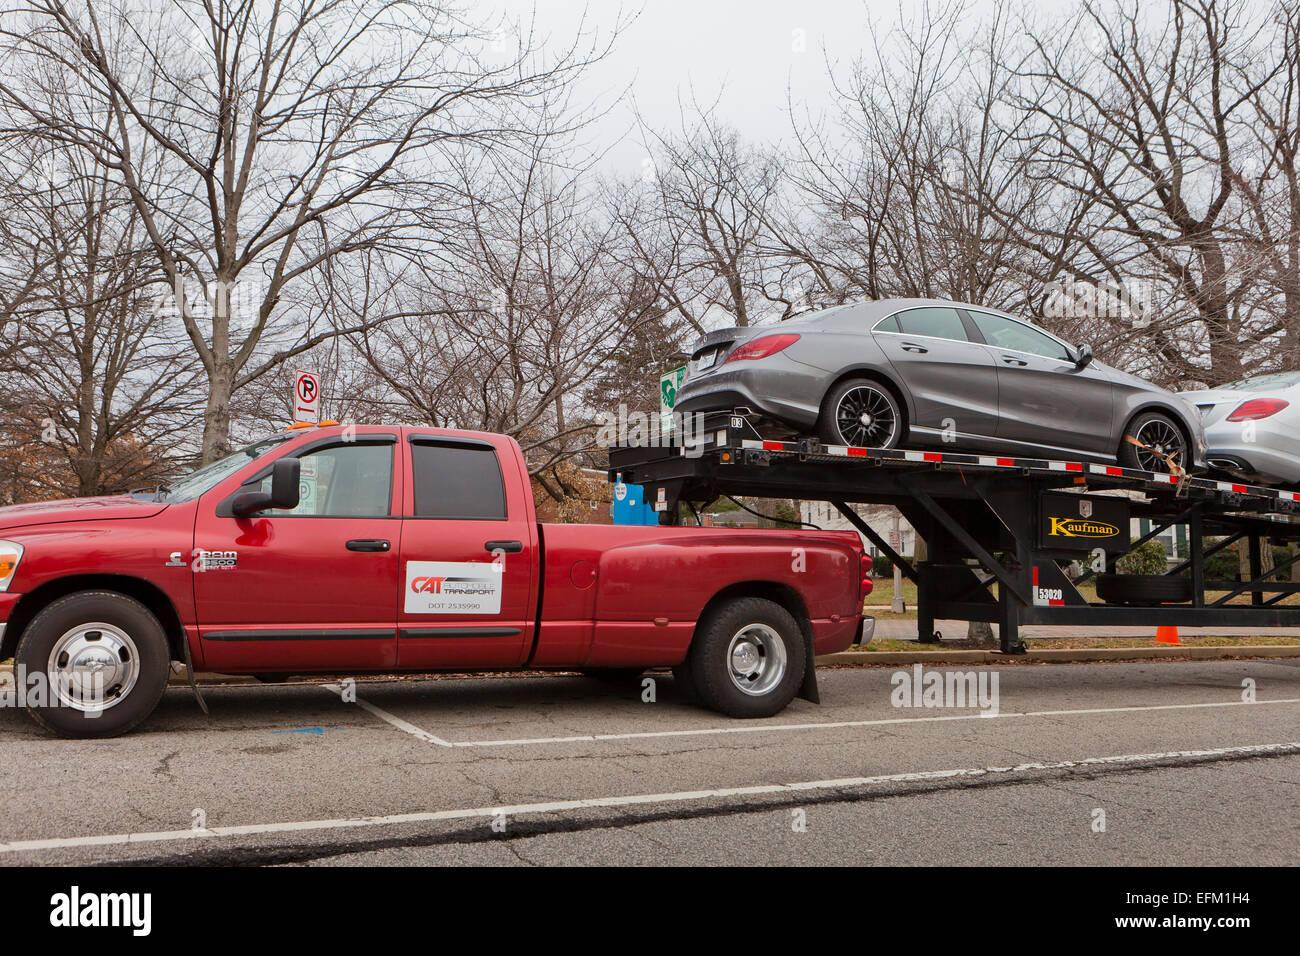 Pickup Car Imágenes De Stock & Pickup Car Fotos De Stock - Alamy